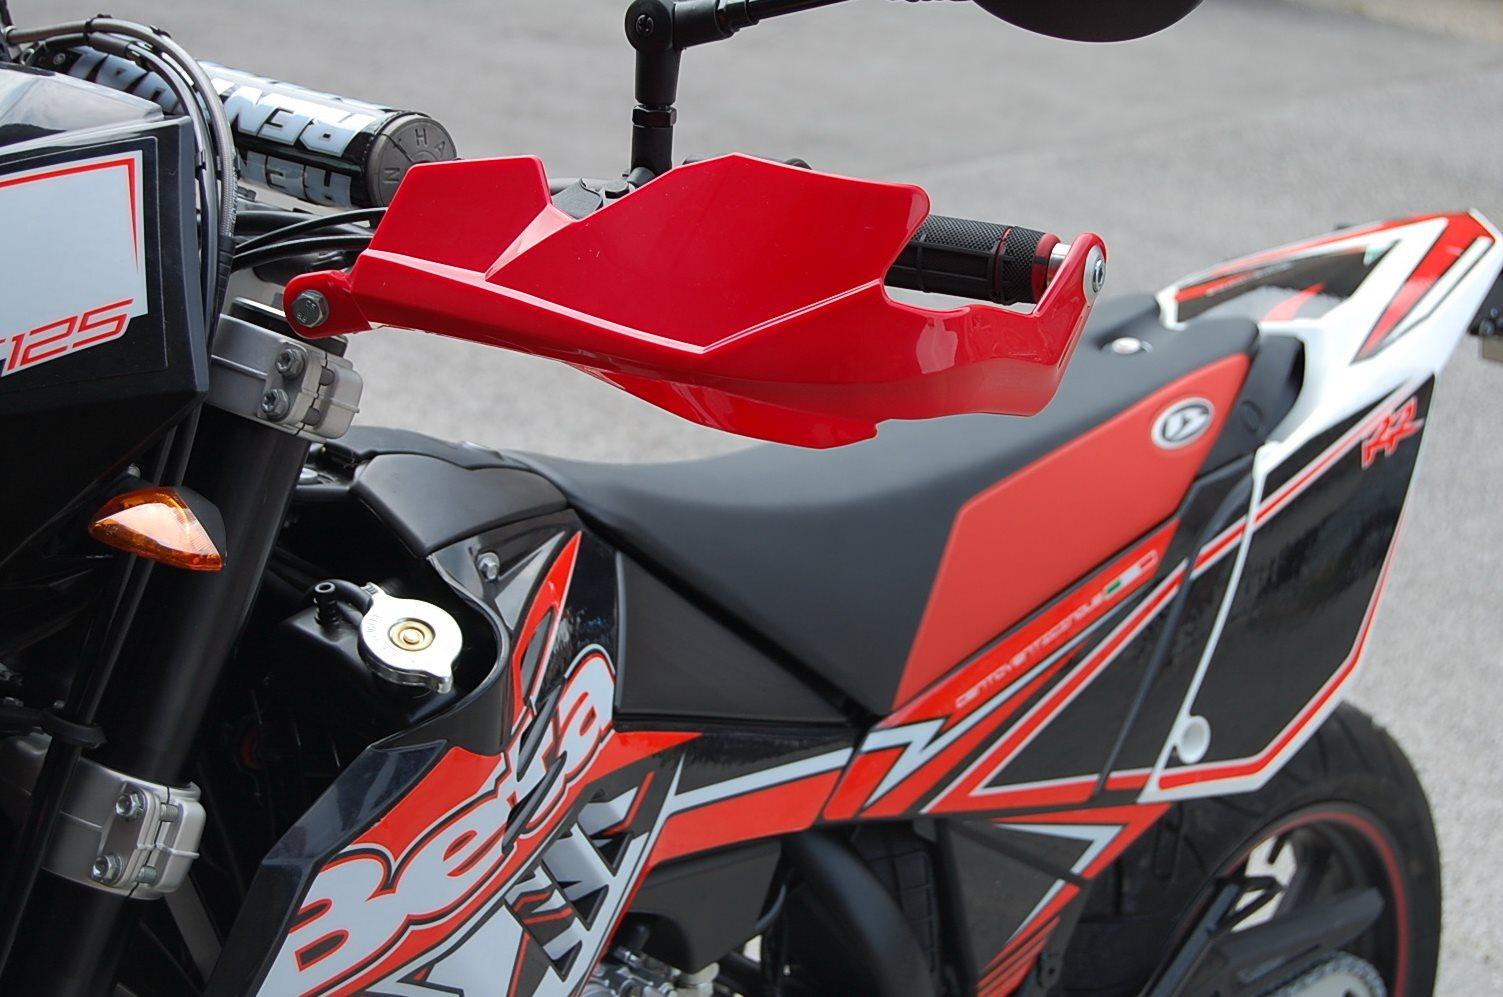 umgebautes motorrad beta rr motard 125 4t lc von hk. Black Bedroom Furniture Sets. Home Design Ideas